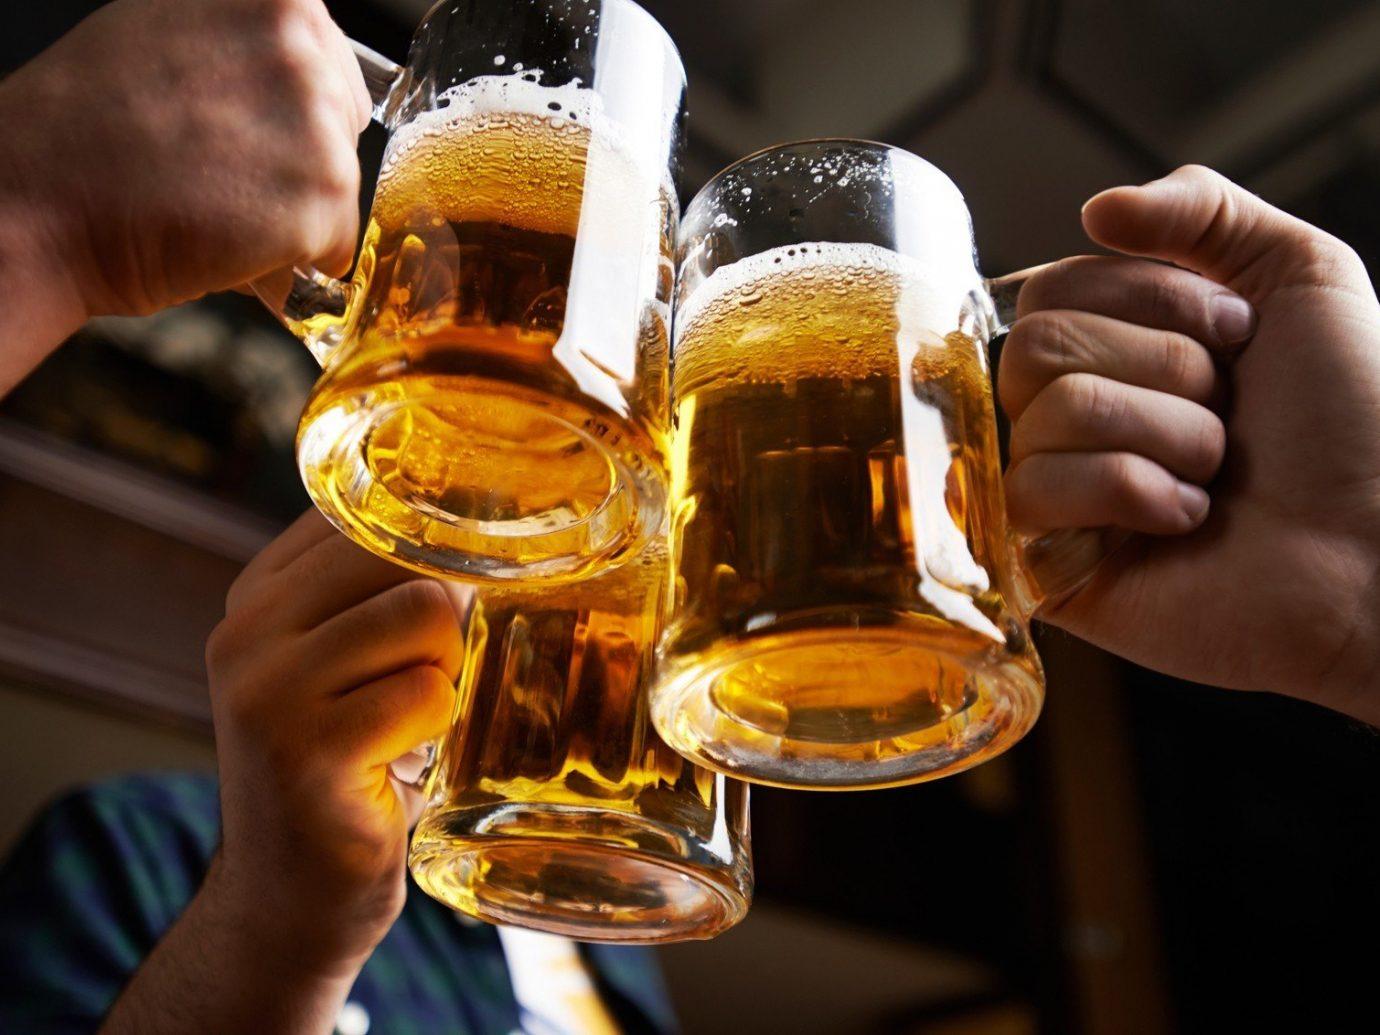 Trip Ideas person indoor Drink glass alcoholic beverage distilled beverage beer alcohol whisky hand sense wine bottle